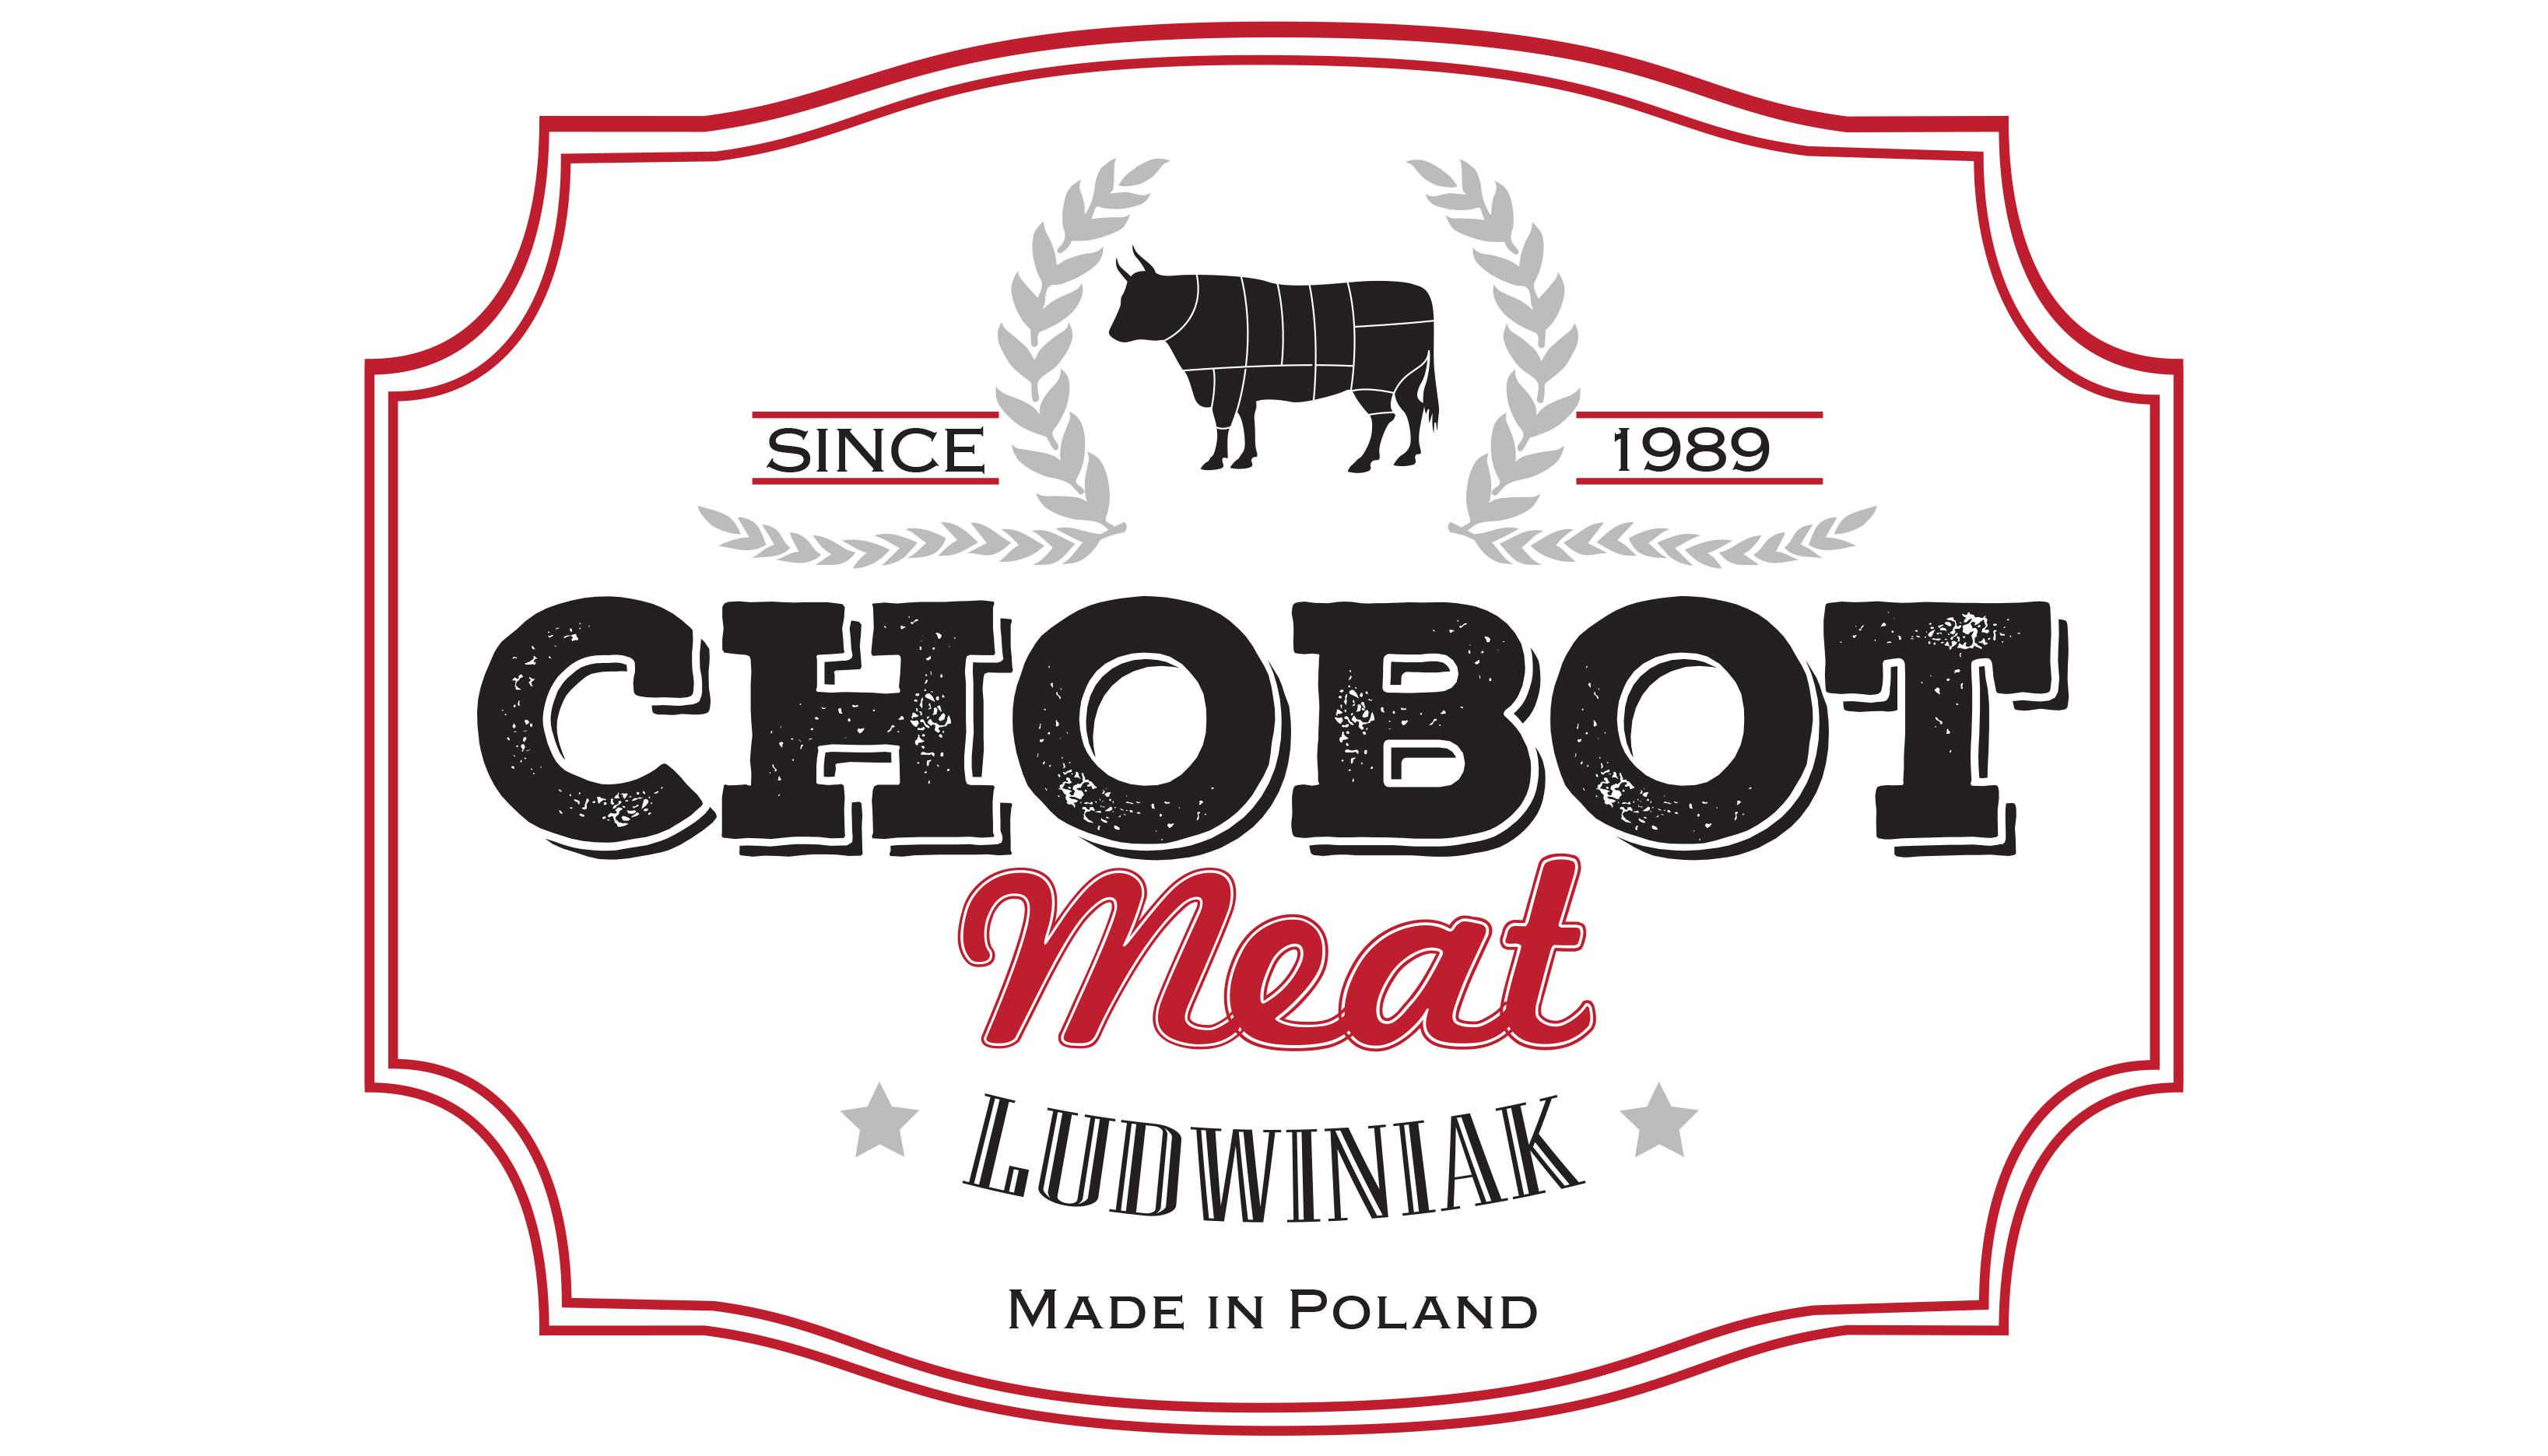 5c51976792e55Chobot_Meat_logo_obwiednia.jpg